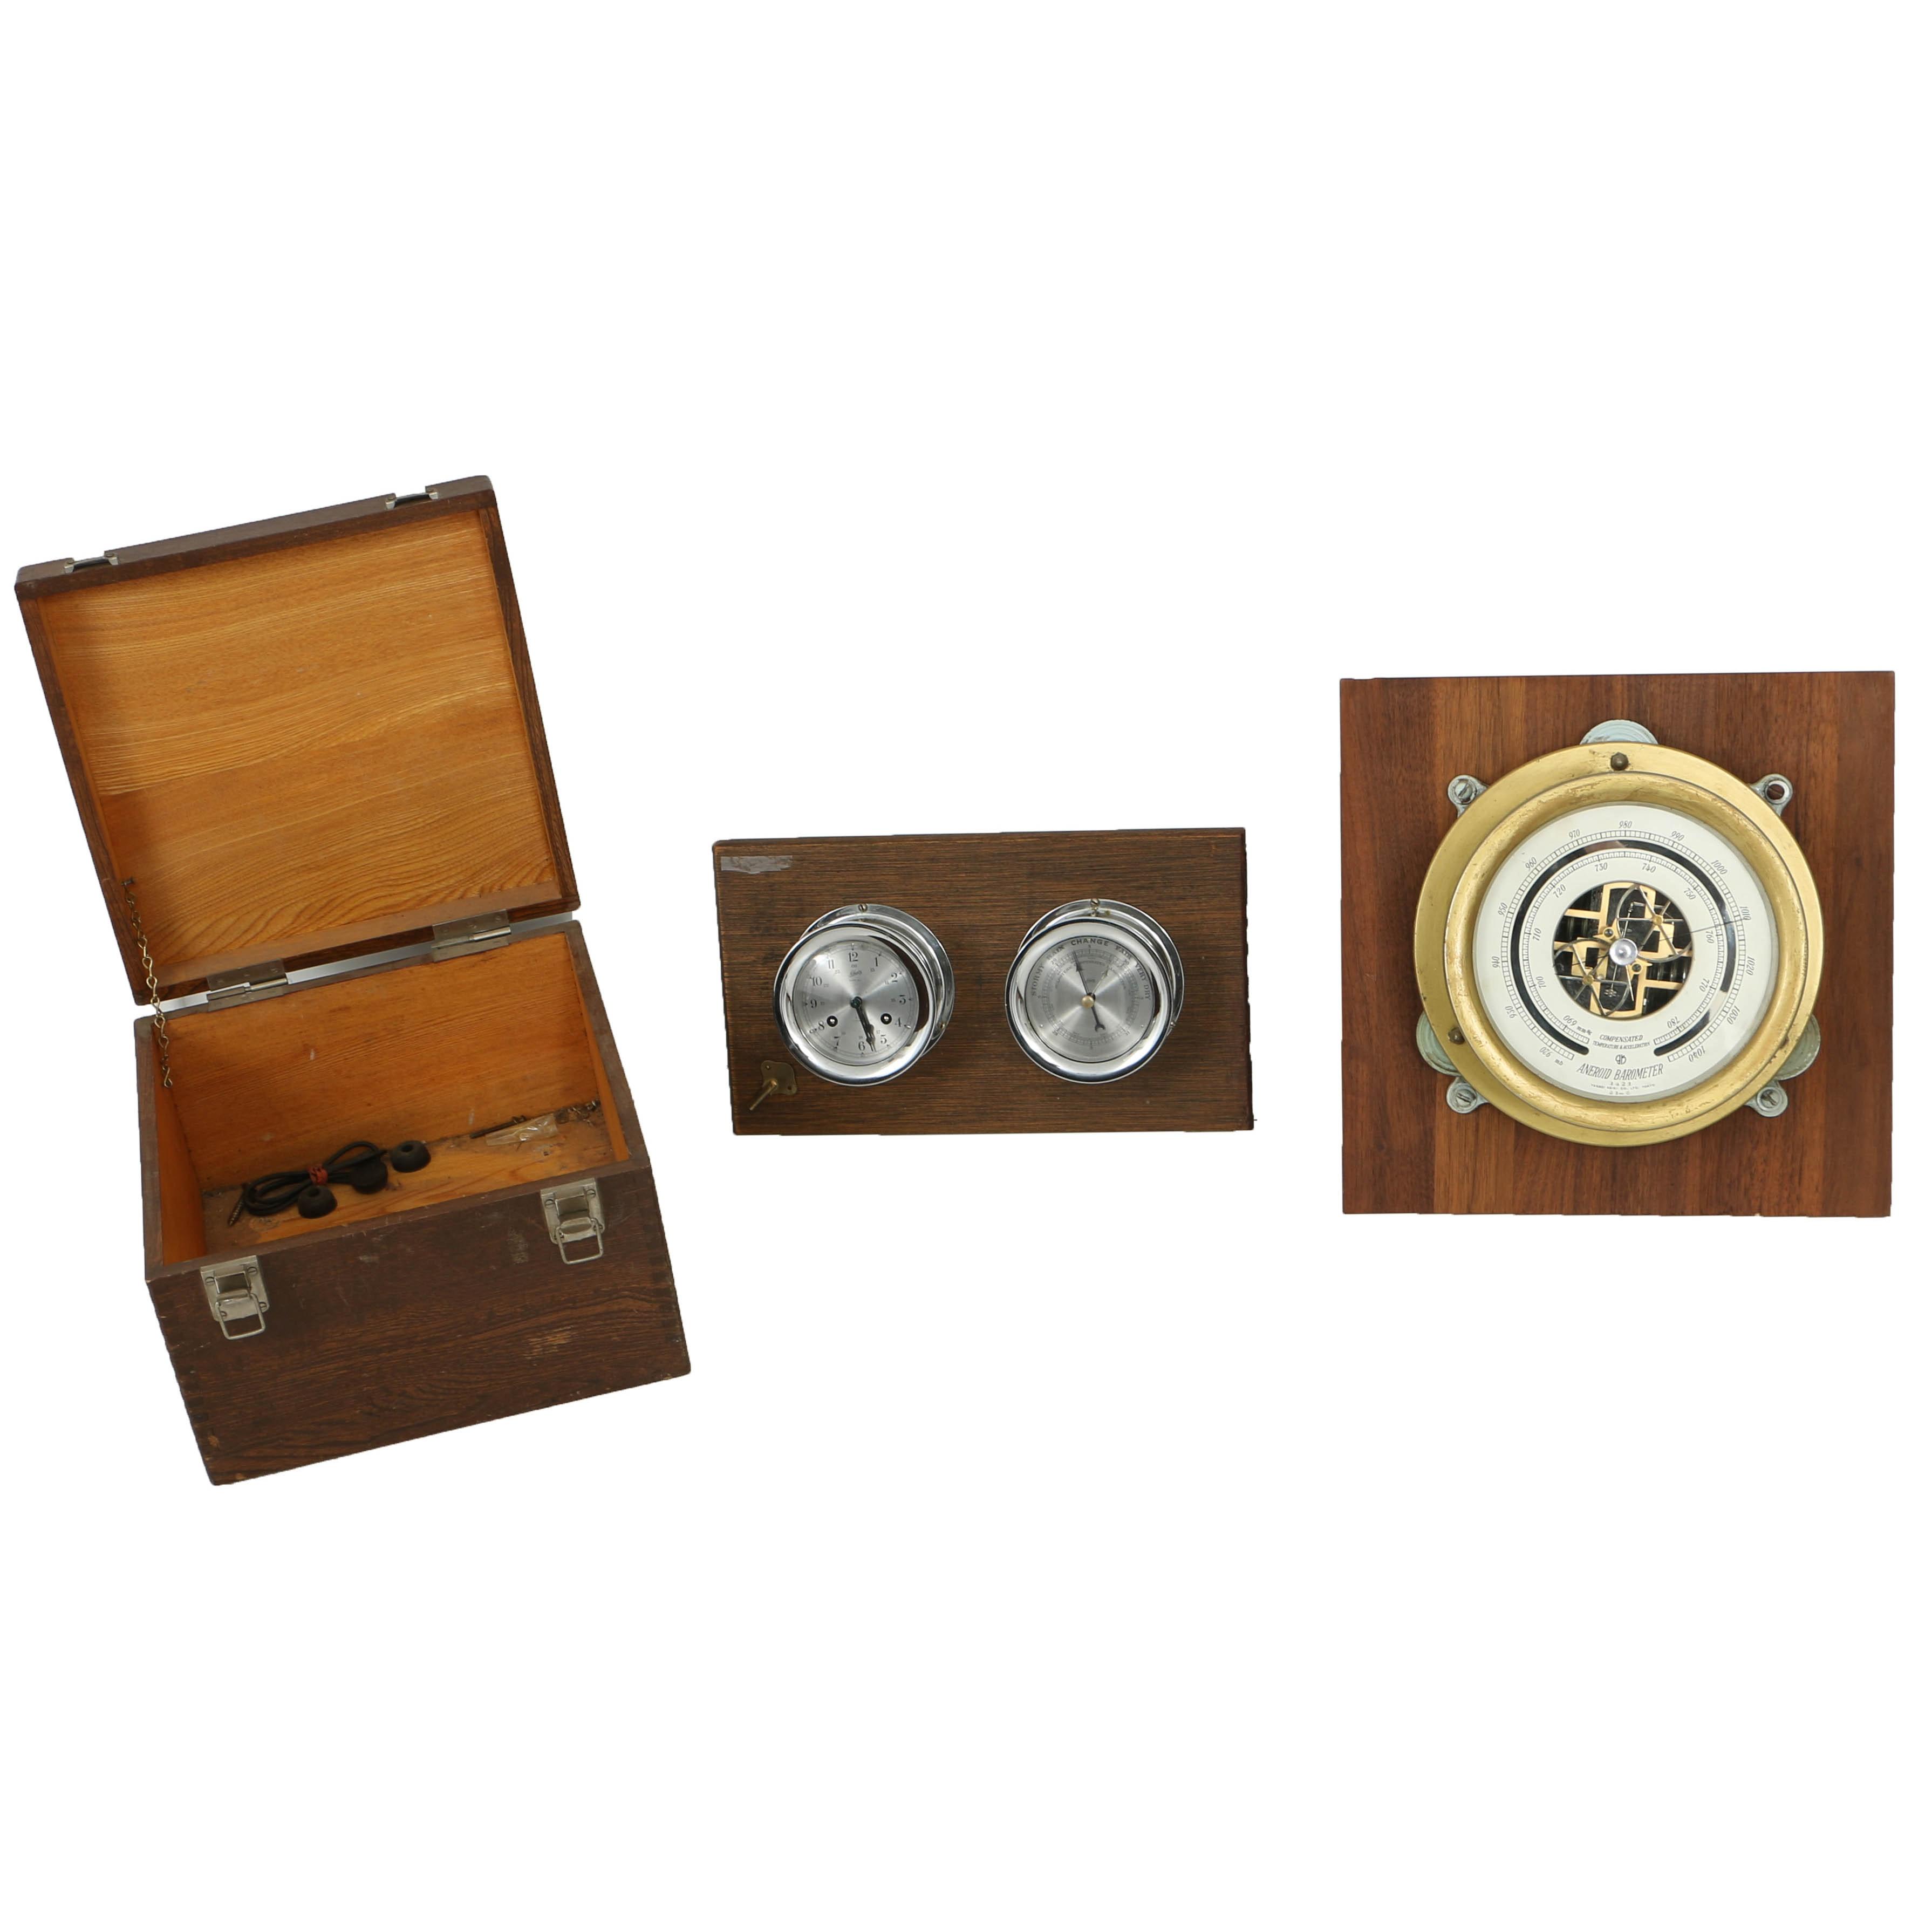 Vintage Yanagi Keiki Co. Barometer with Box Plus Schatz Barometer and Clock